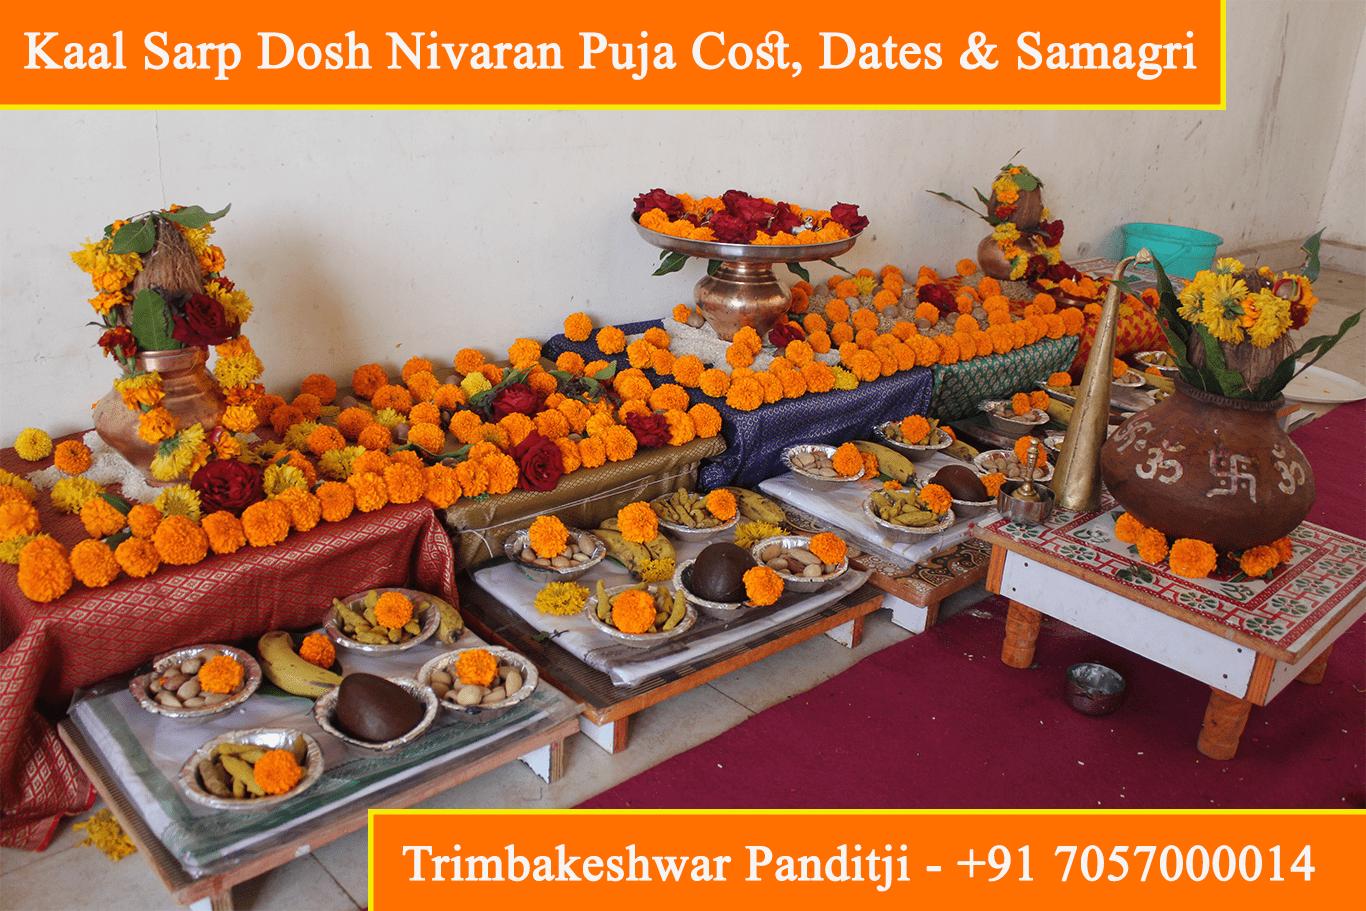 Kaal Sarp Dosh Nivaran Puja Cost, Dates, Muhurat, Remedies, Samagri